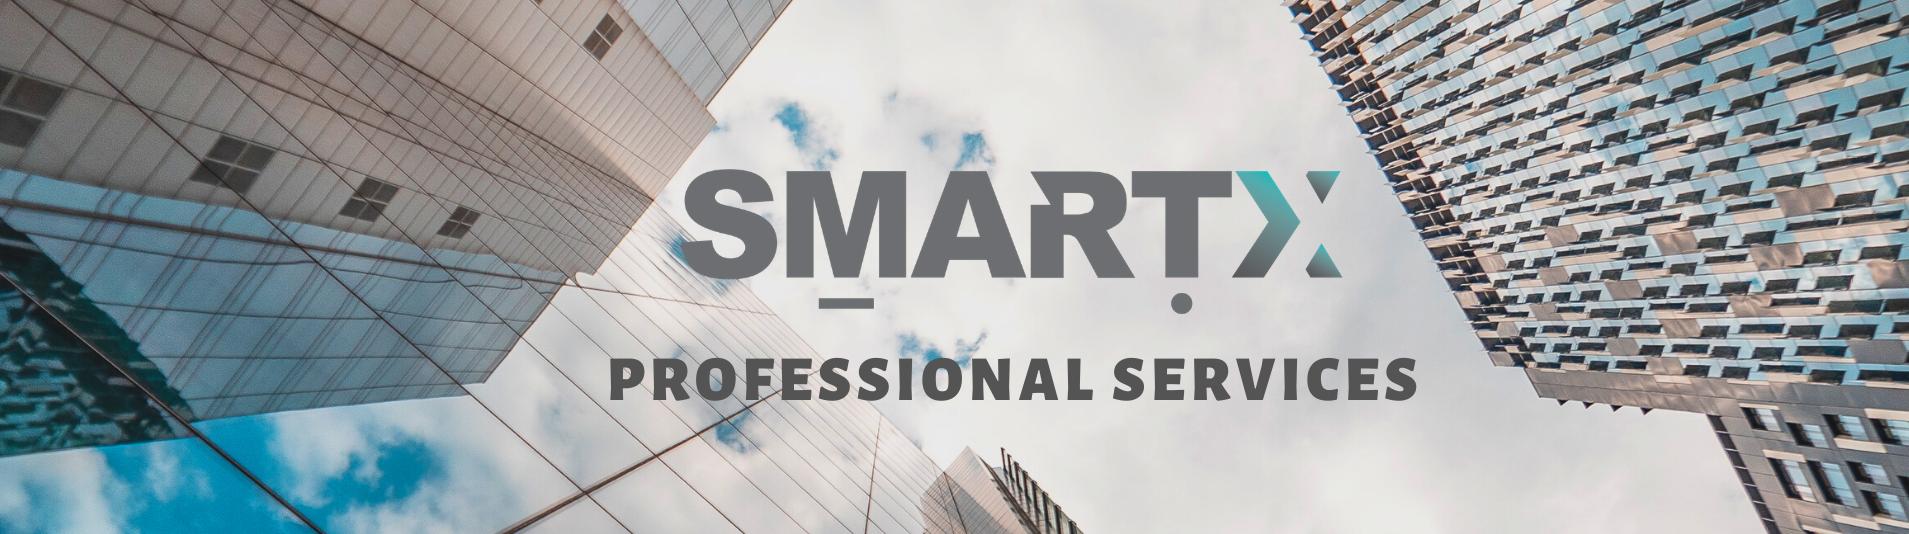 smartx banner